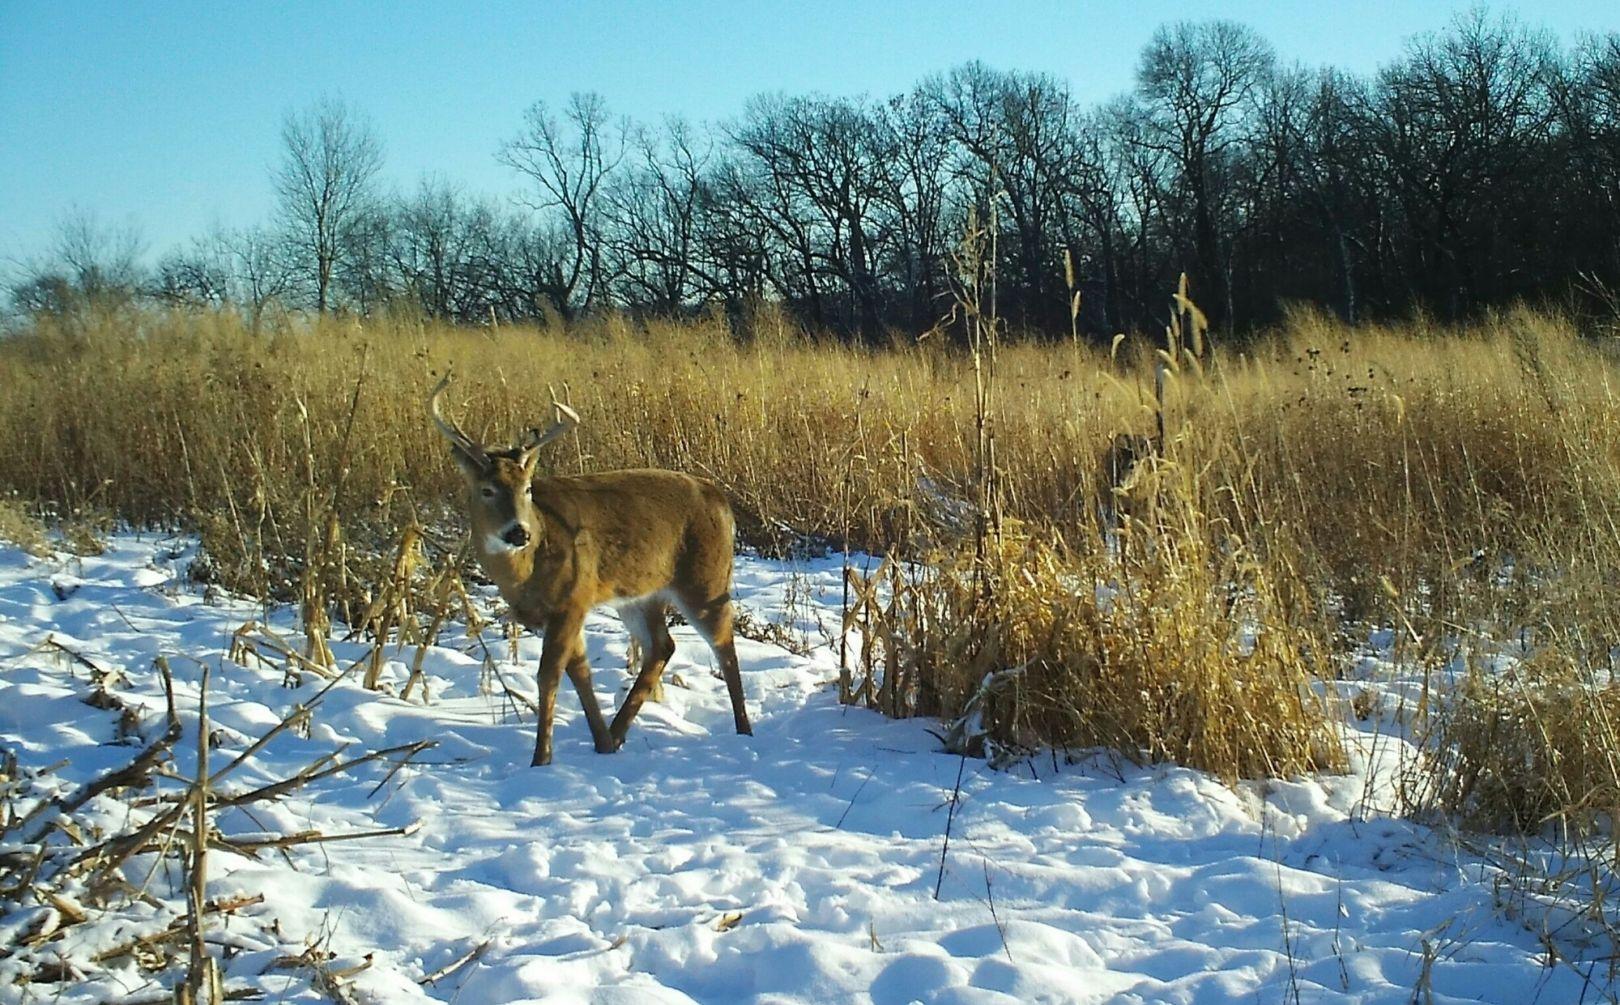 Creating Whitetail Habitat Quickly